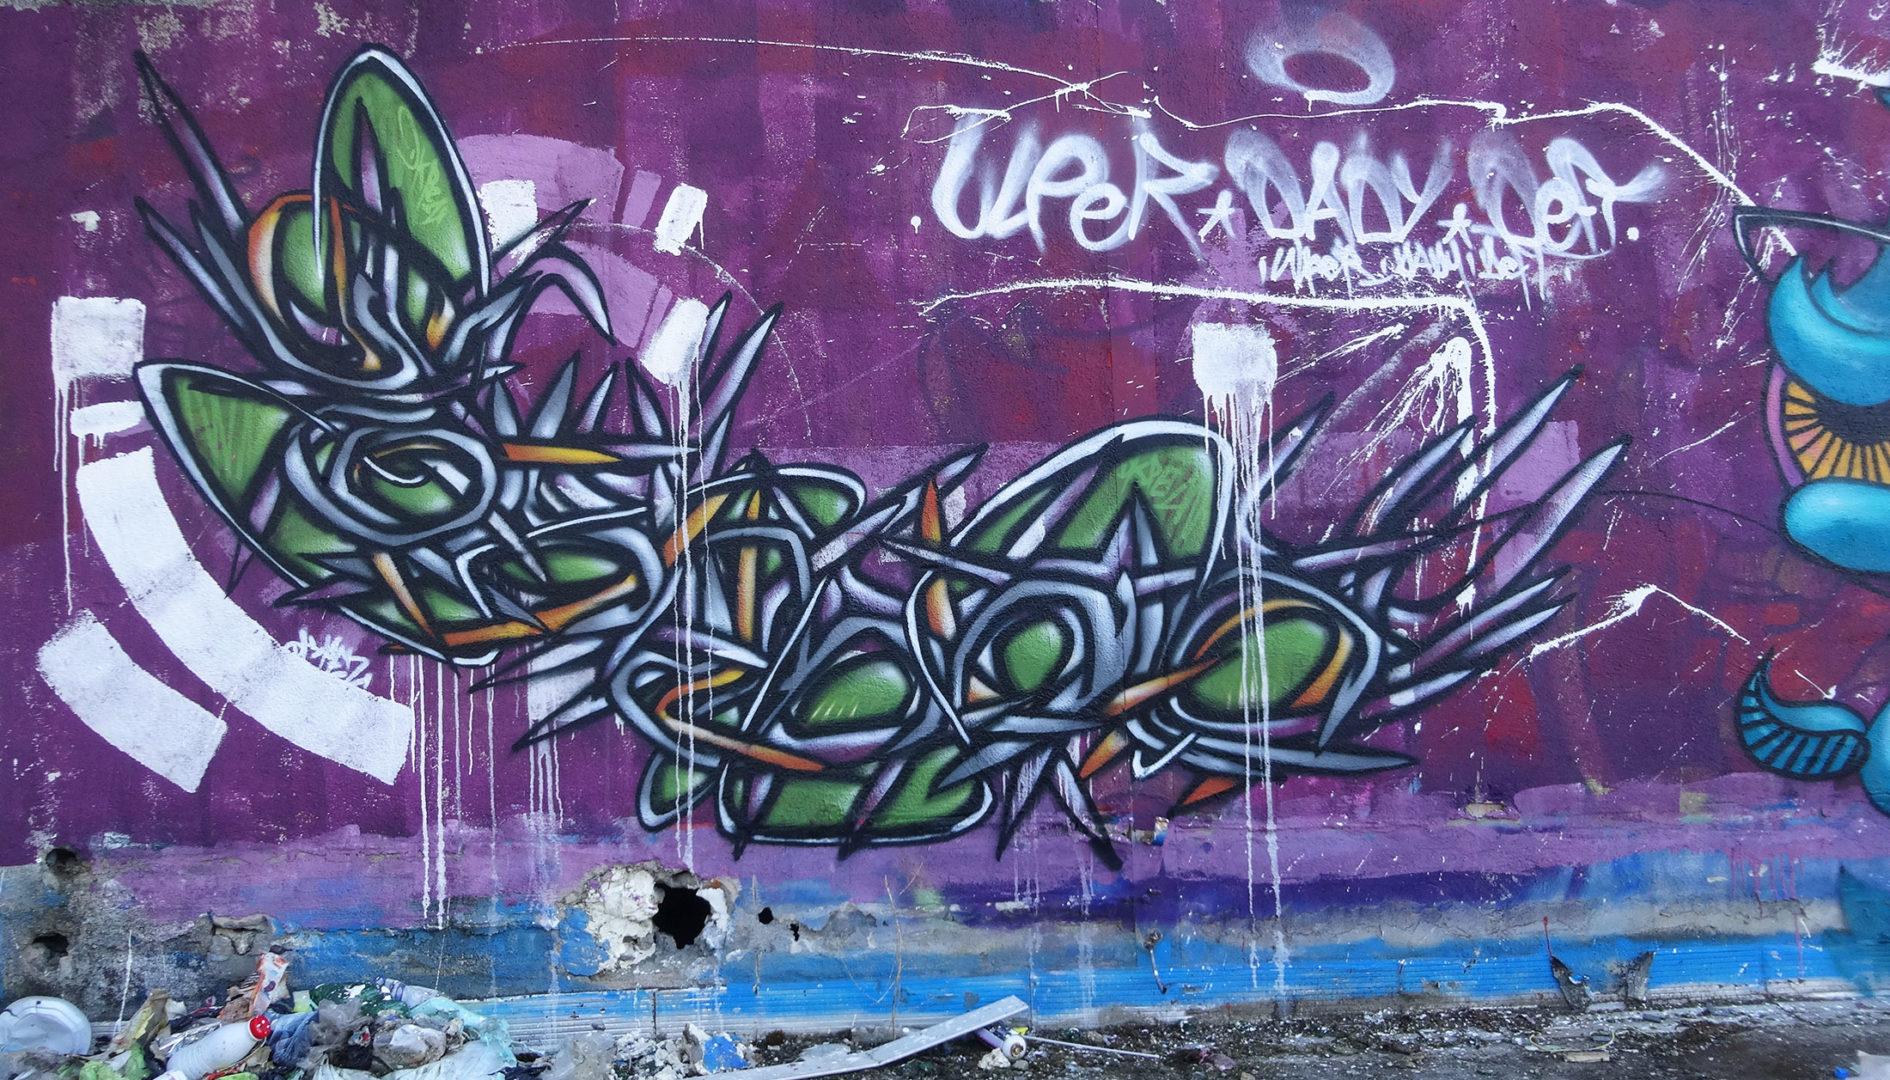 2015_04_deft_graffiti_toulouse_entrepro_ulper_dady_3_ulper